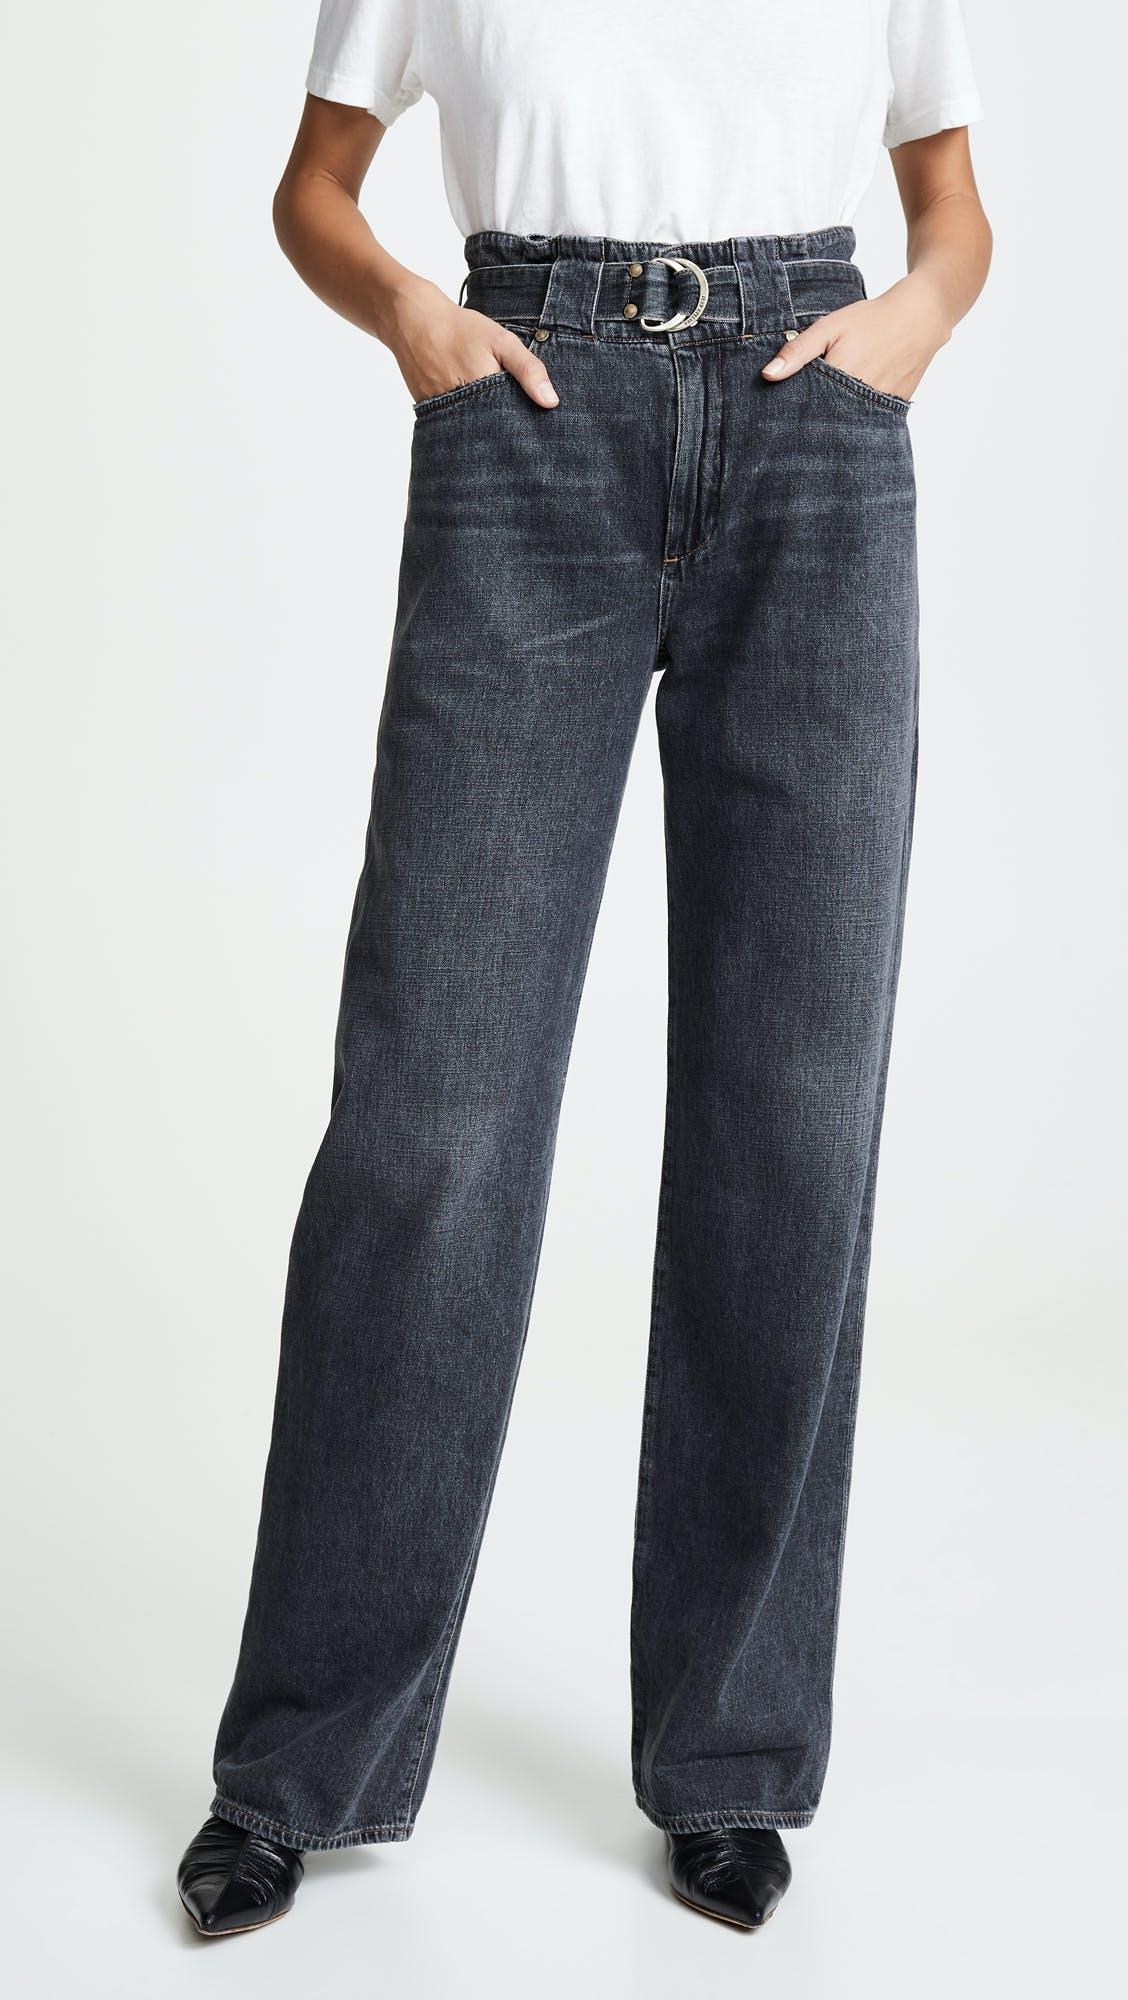 jean atelier, cinch waist jeans, paperbag waist, belted jeans, high rise jeans, high waisted jeans, wide leg jeans, belted jeans